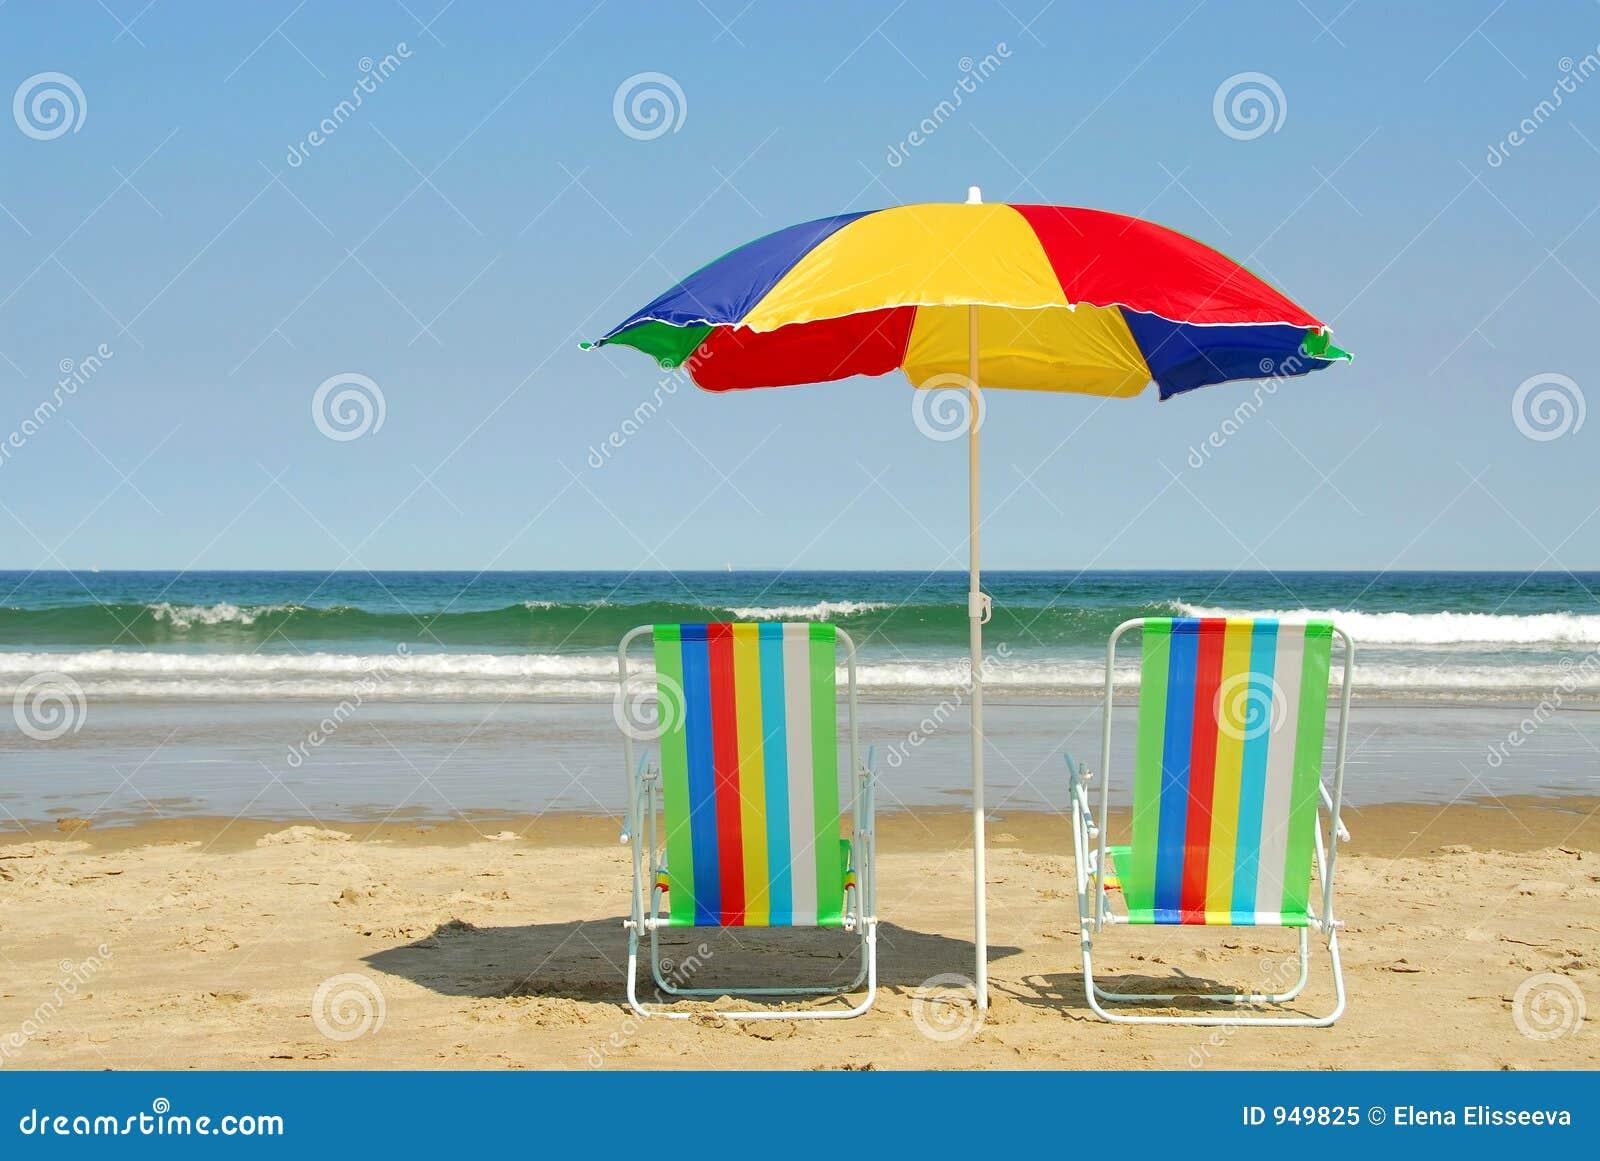 Beach chair umbrella - Beach Chairs And Umbrella Royalty Free Stock Photo Image 949825